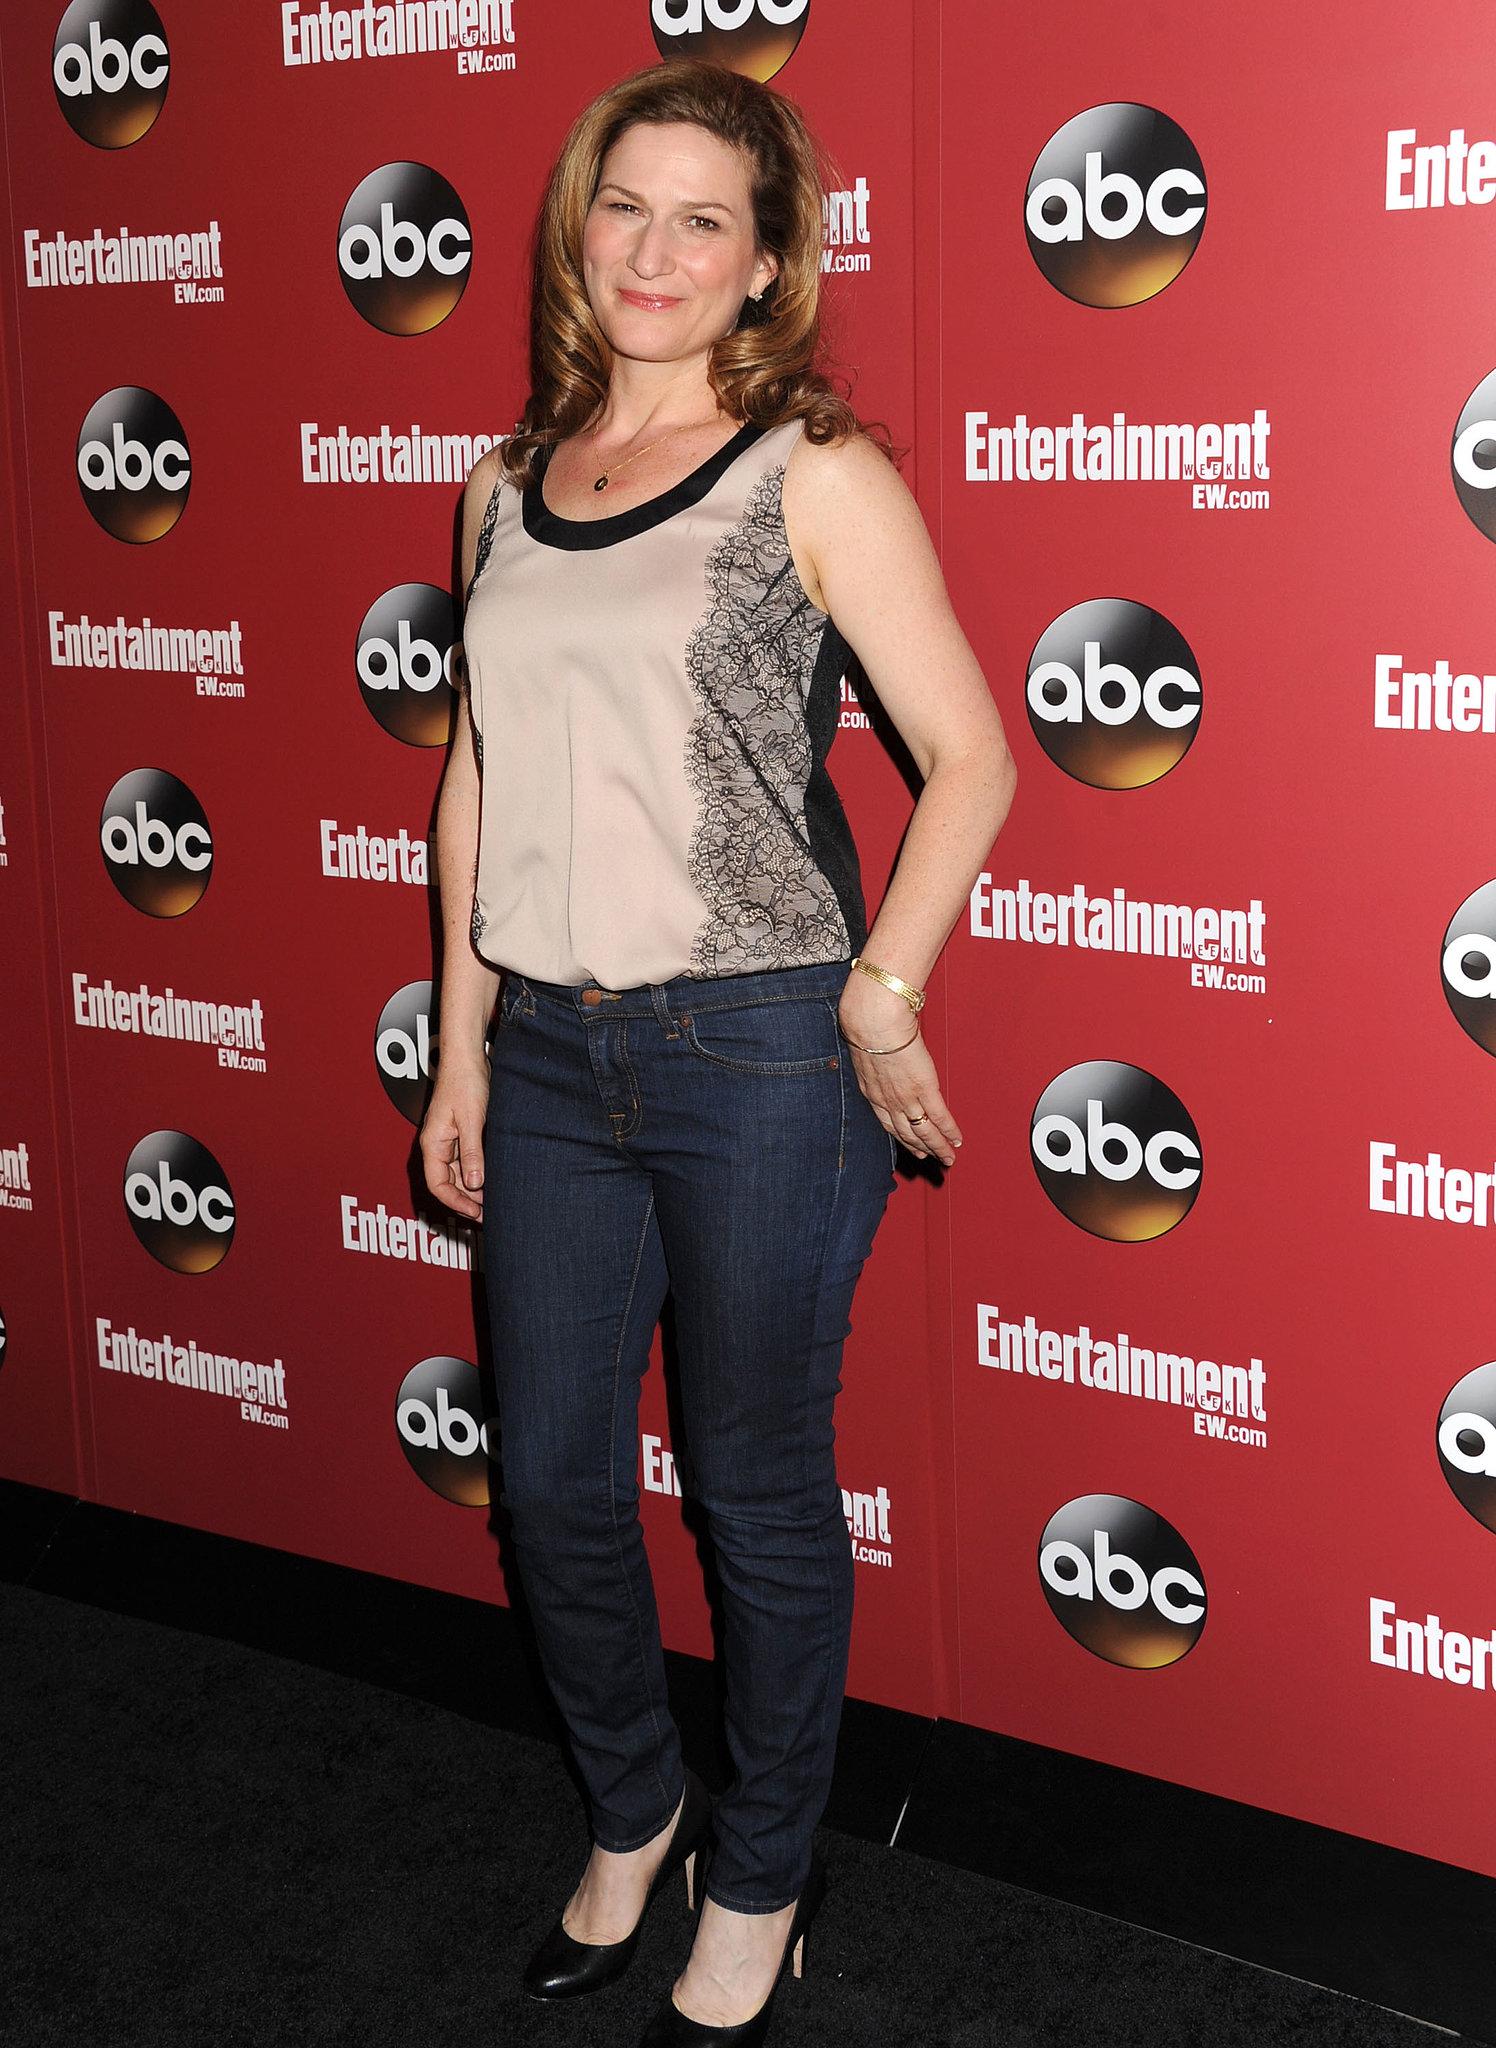 Ana Gasteyer represented her ABC show, Suburgatory.